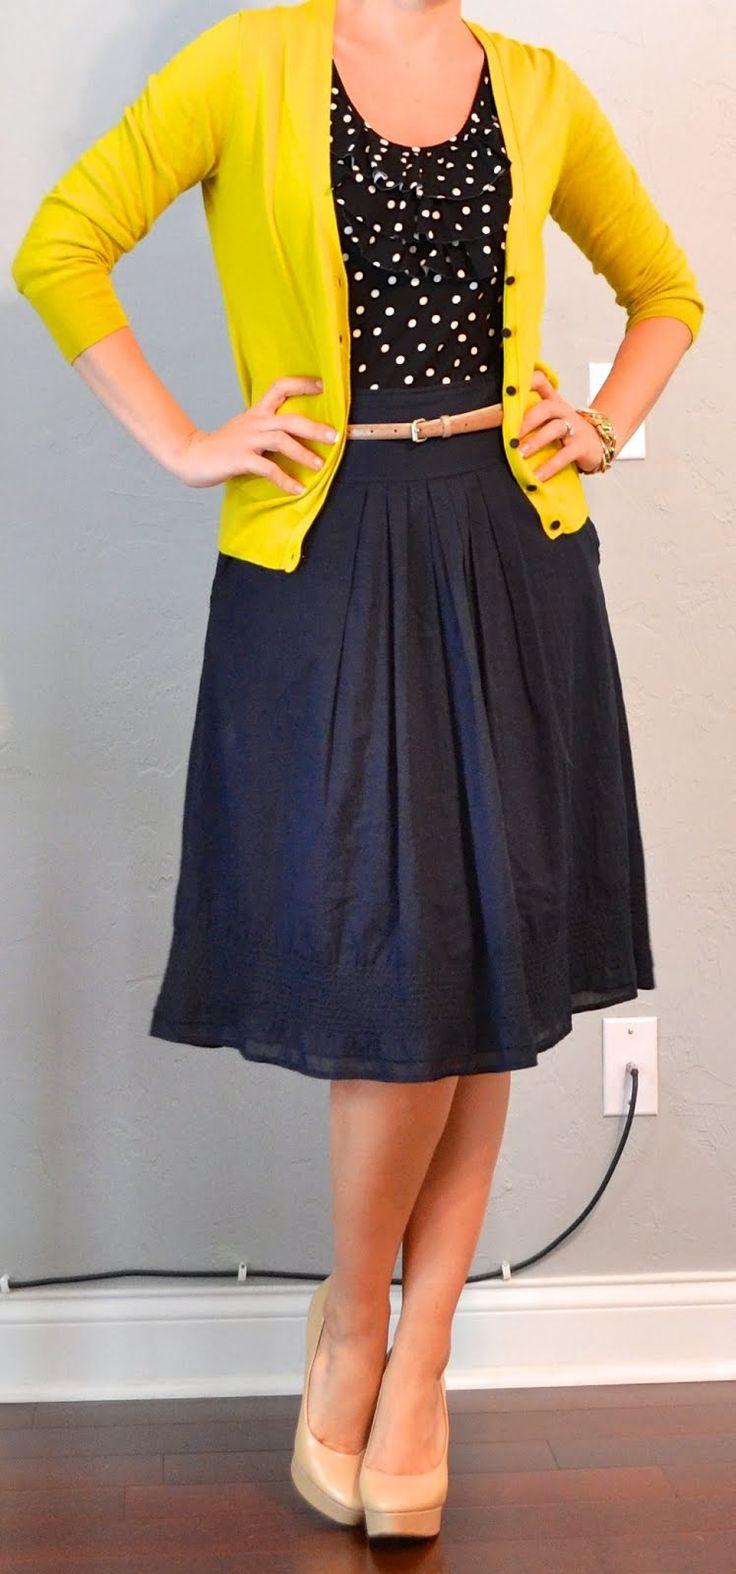 63 best Outfits - Polka Dot Shirt images on Pinterest | Big shot ...